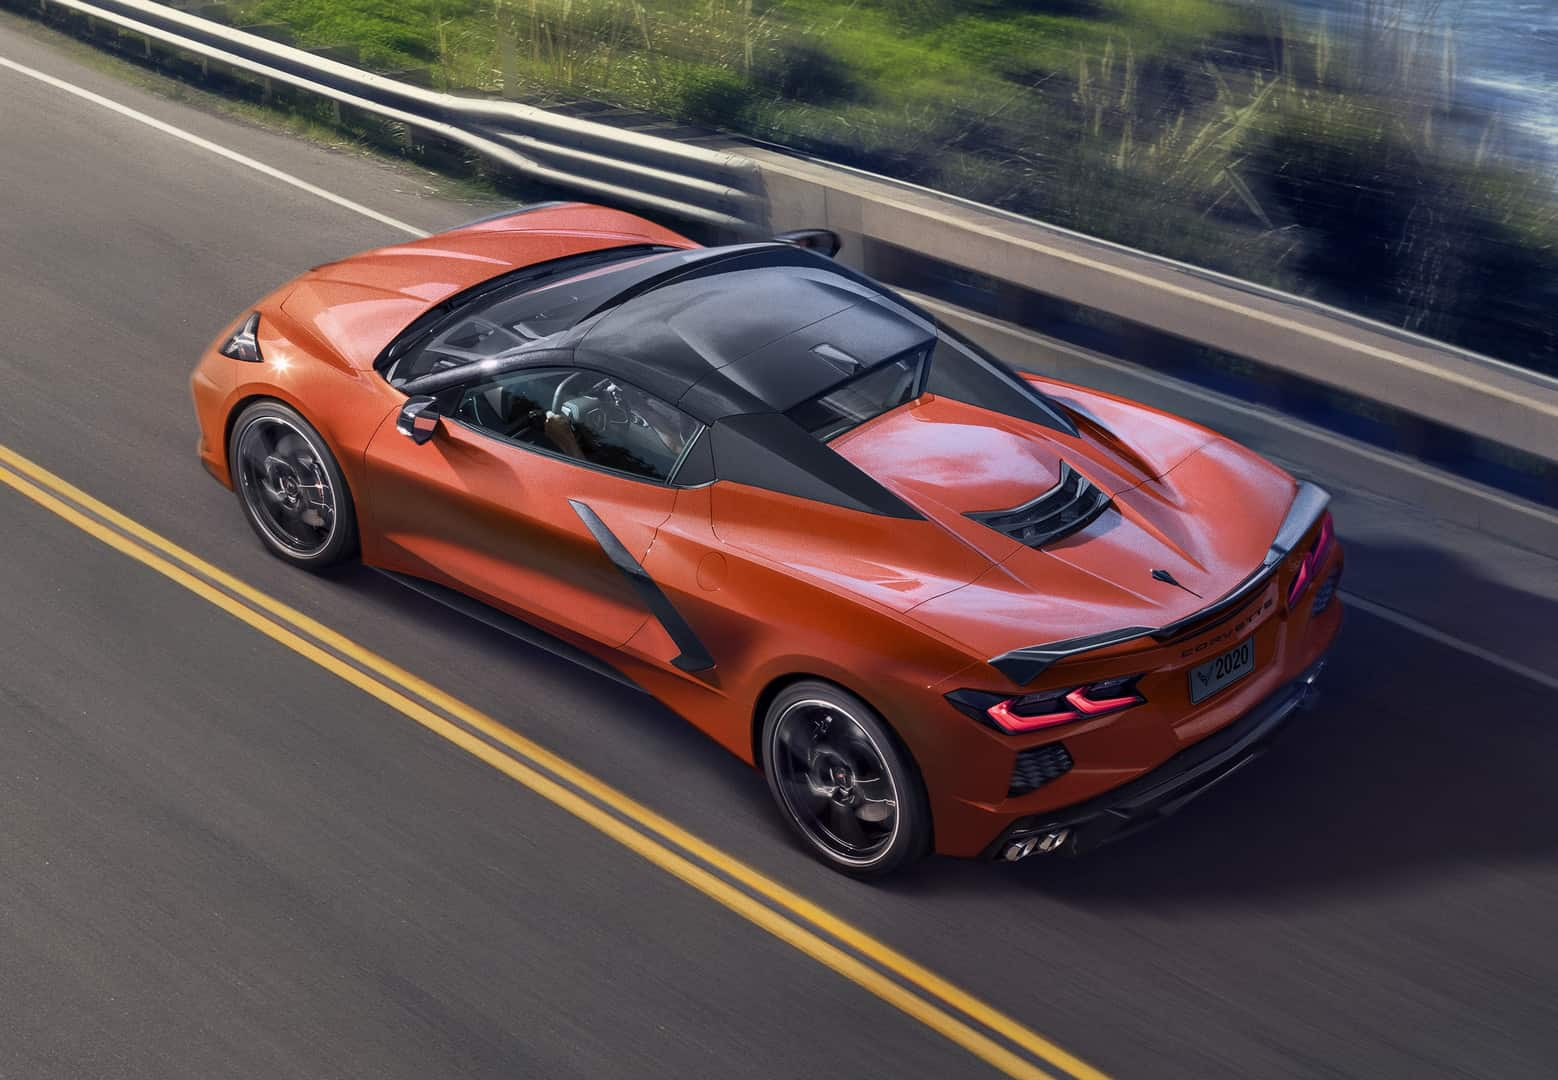 2020 Chevrolet Corvette Stingray Convertible 8